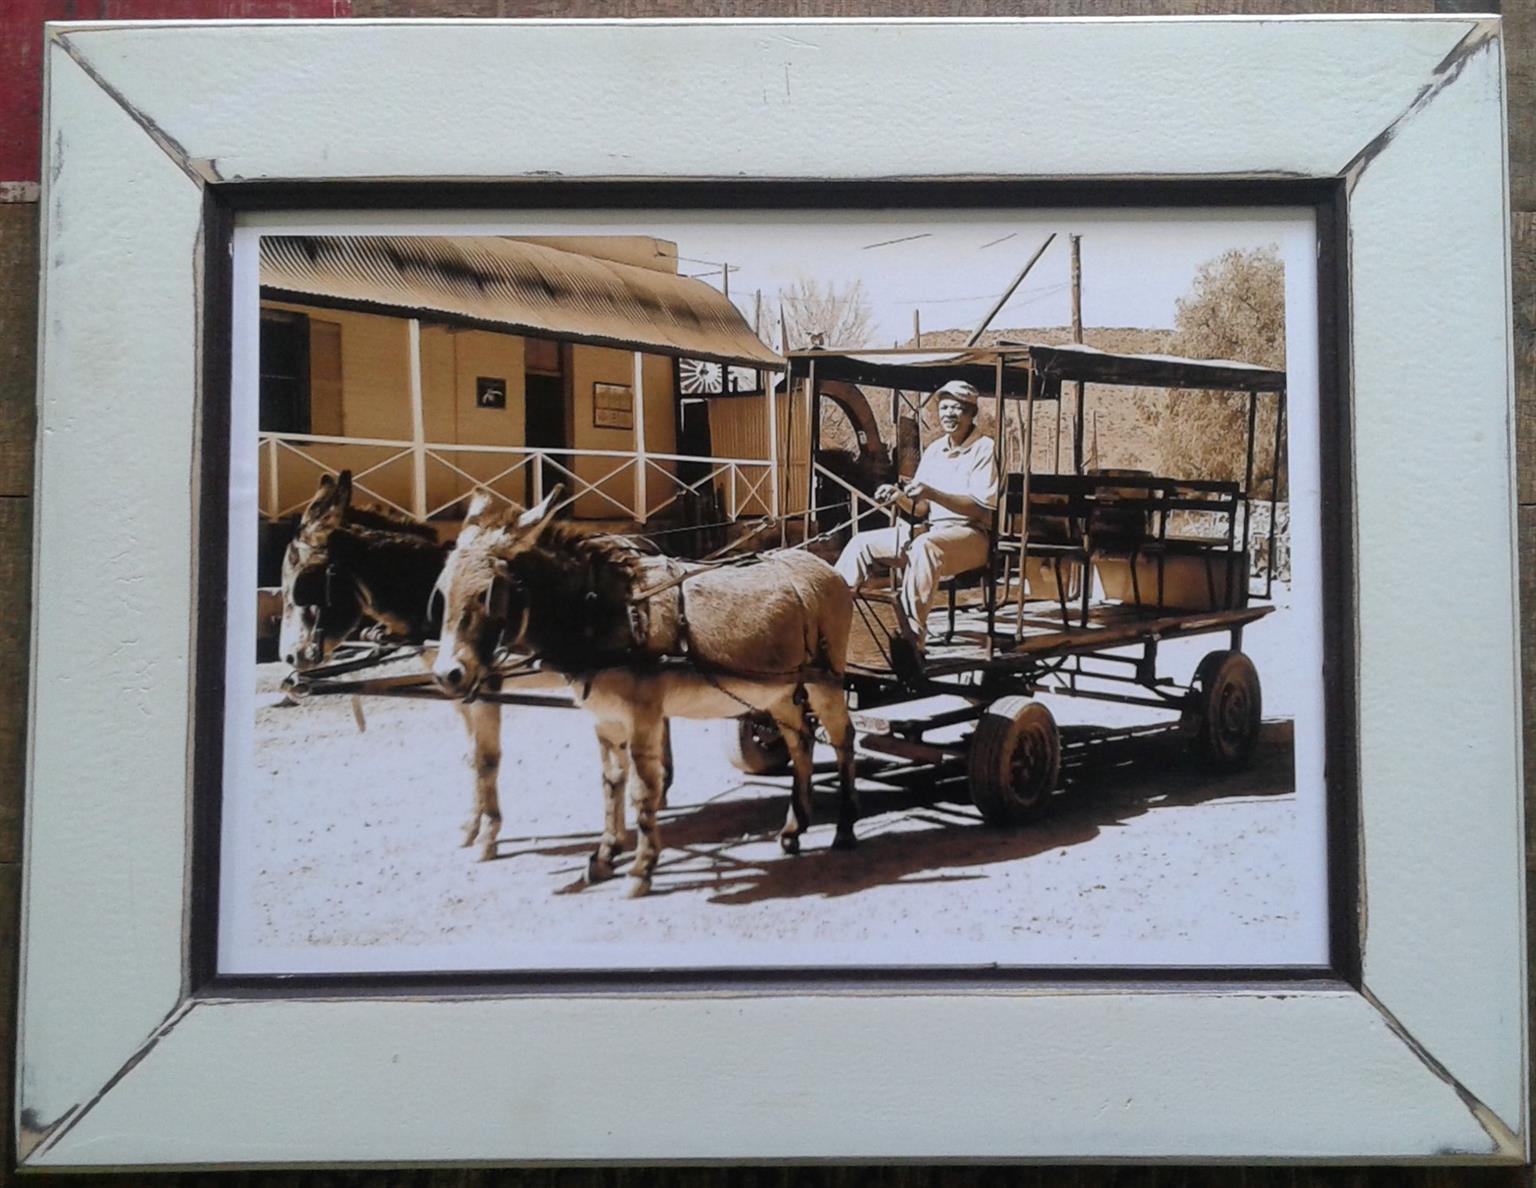 Framed Print: Donkey Cart. Home decor. Wall Art.